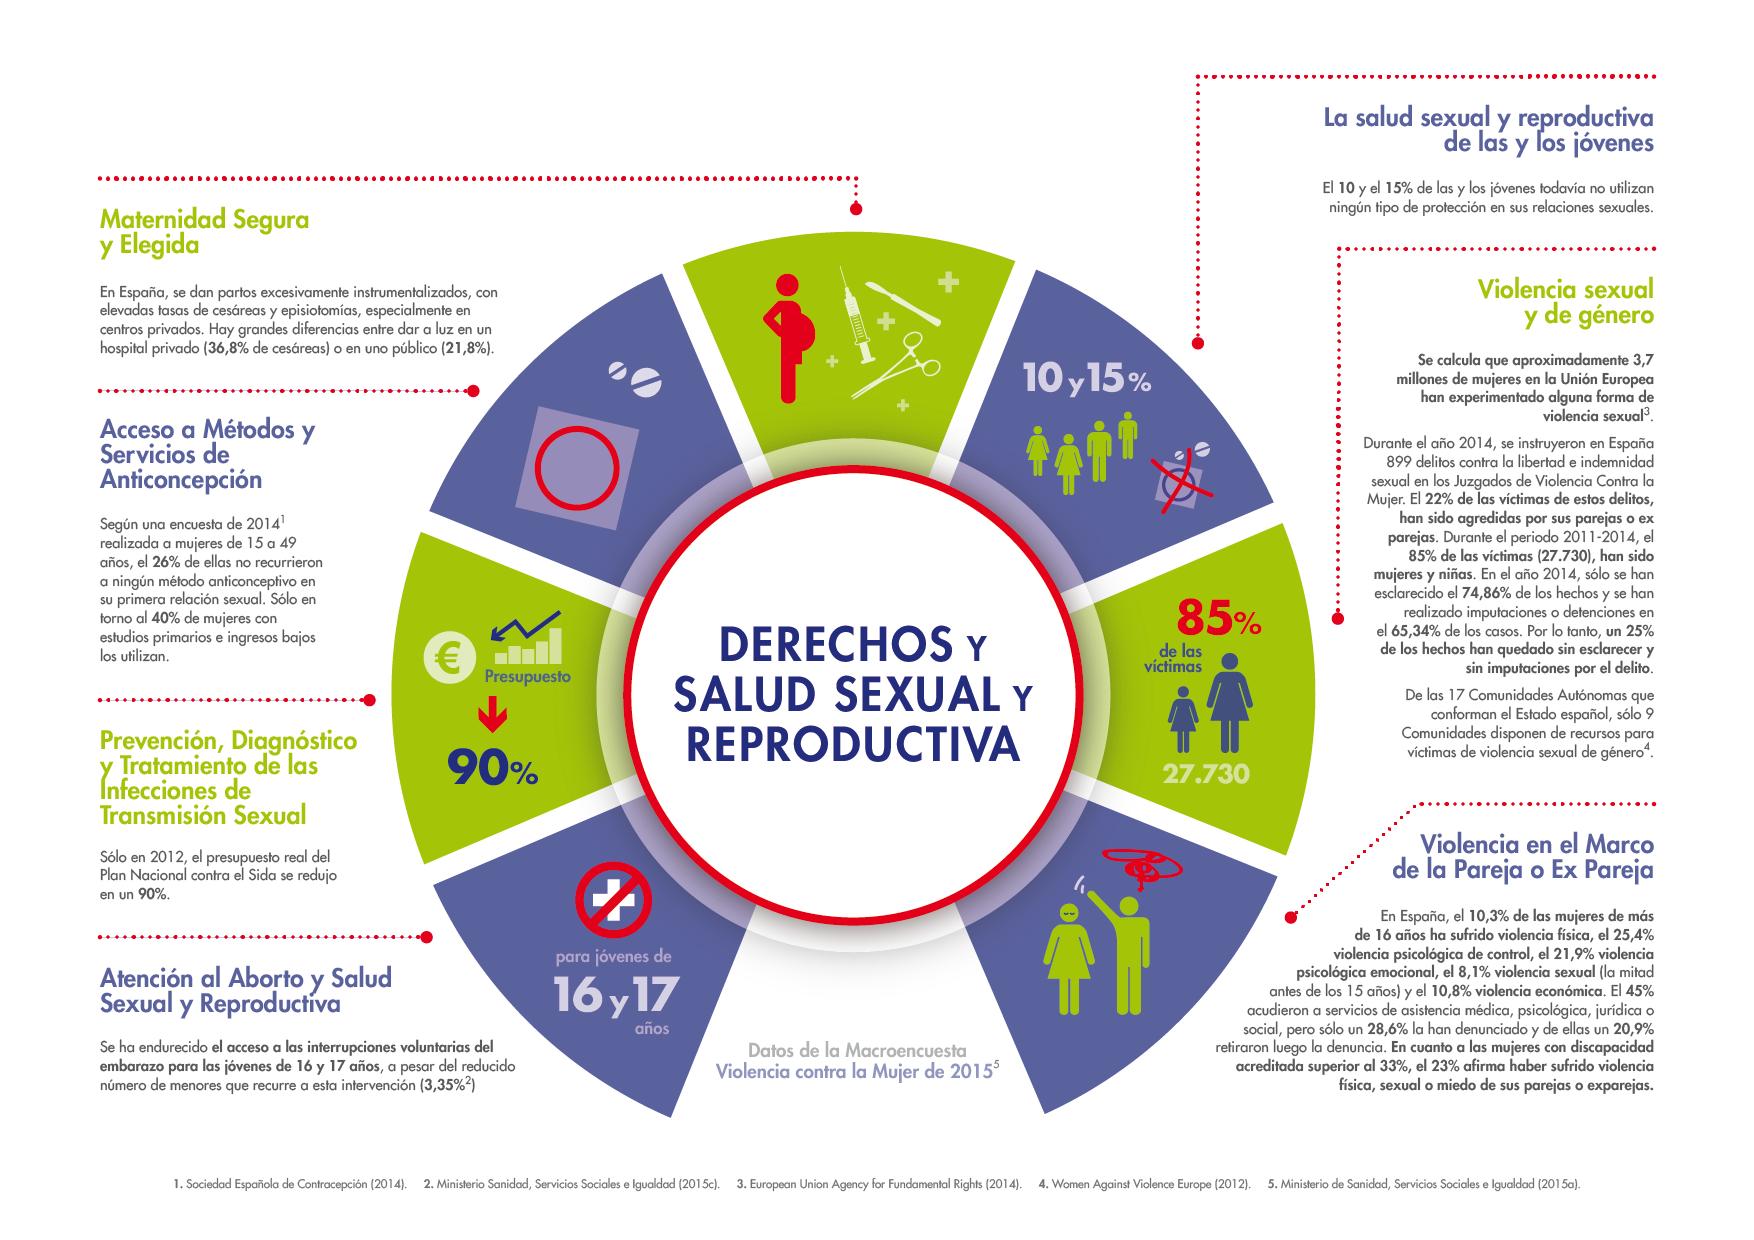 Mdm Infografia Datos Y Cifras 2 - MdM España